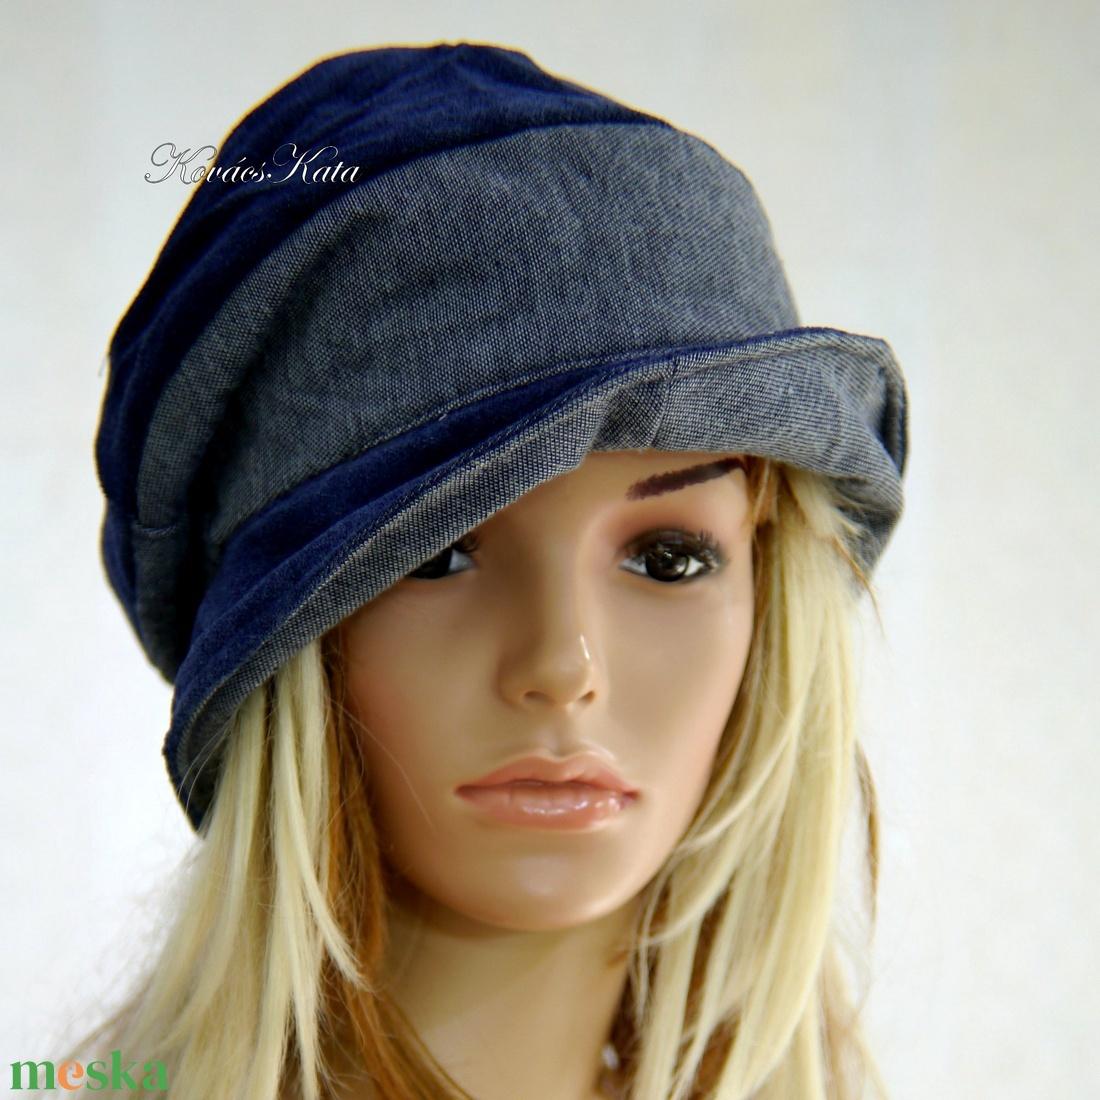 BERTA - farmer design kalap  - ruha & divat - sál, sapka, kendő - kalap - Meska.hu